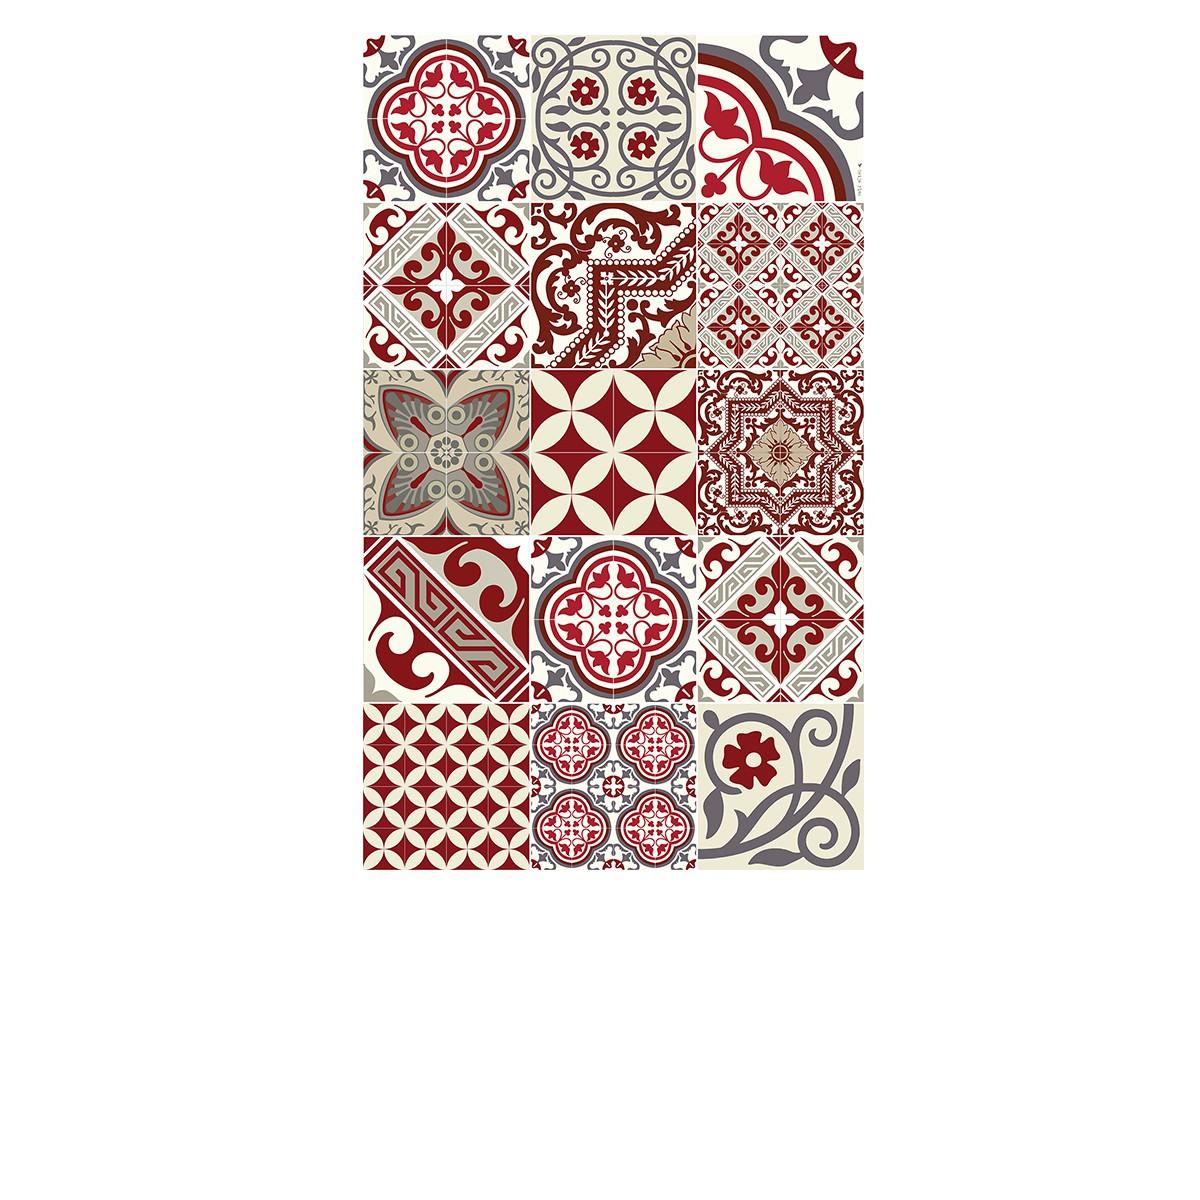 e5 tapis vinyle beija flor eclectic